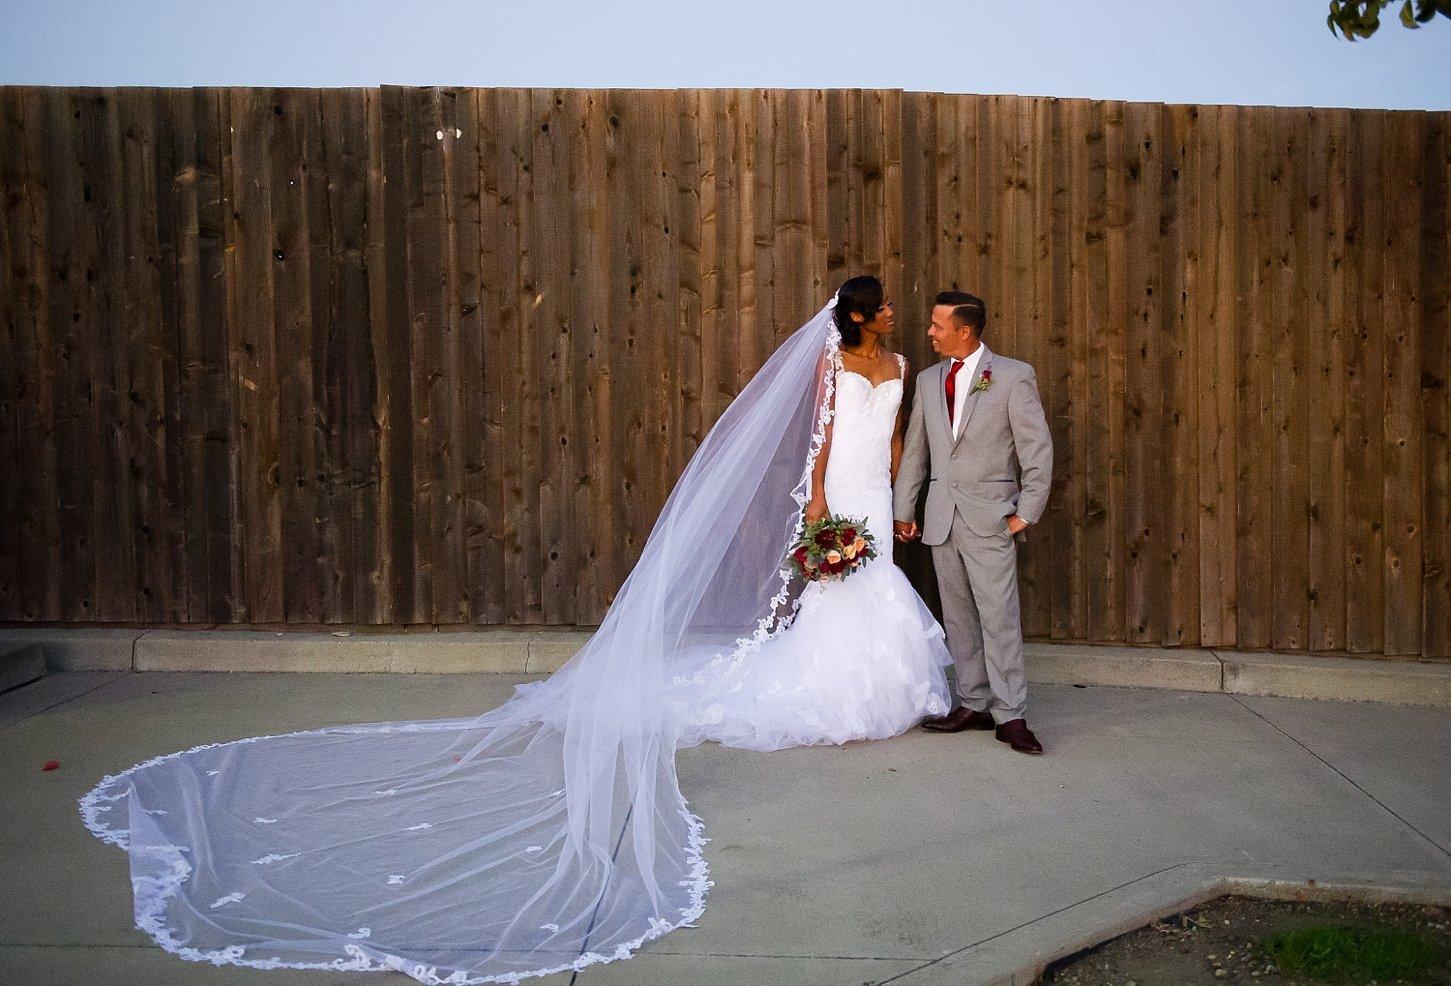 Sneak Peek | Introducing Mr. & Mrs. Leon!!!